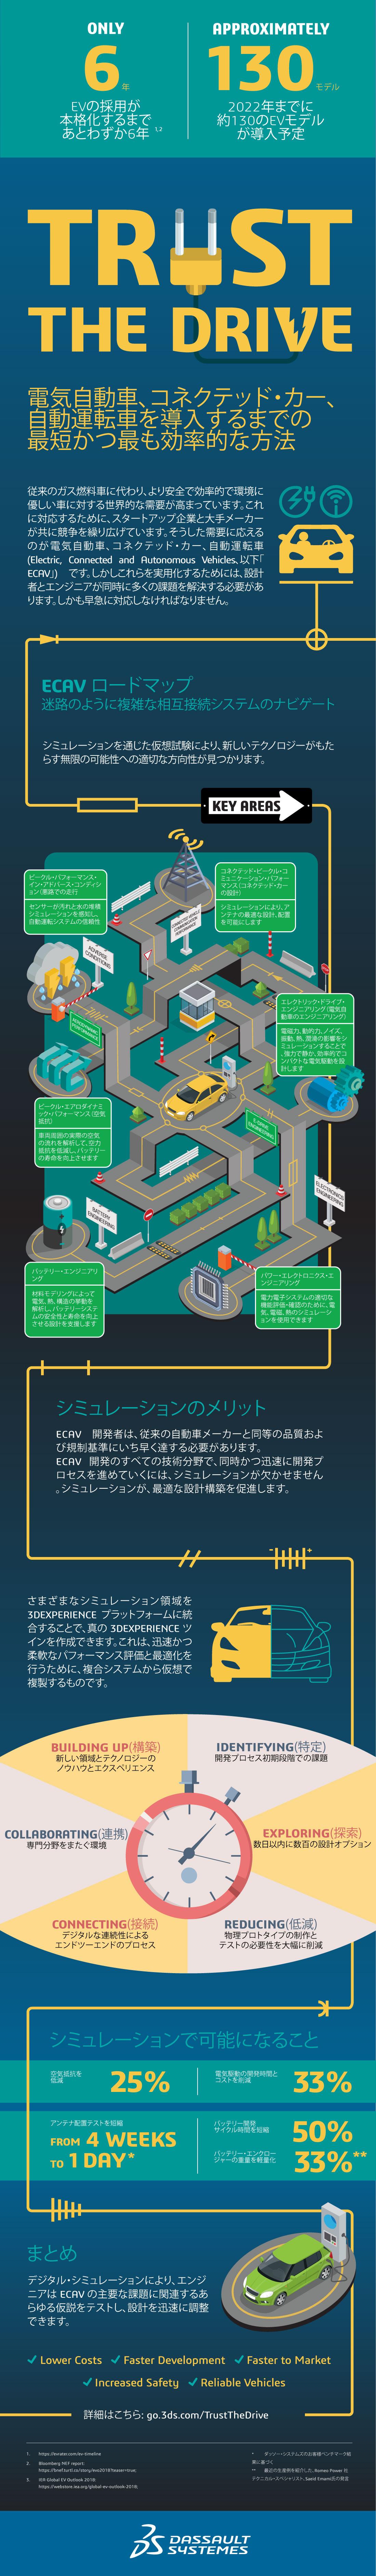 SIMULIA trust the drive >info graphic >  Dassault Systèmes®